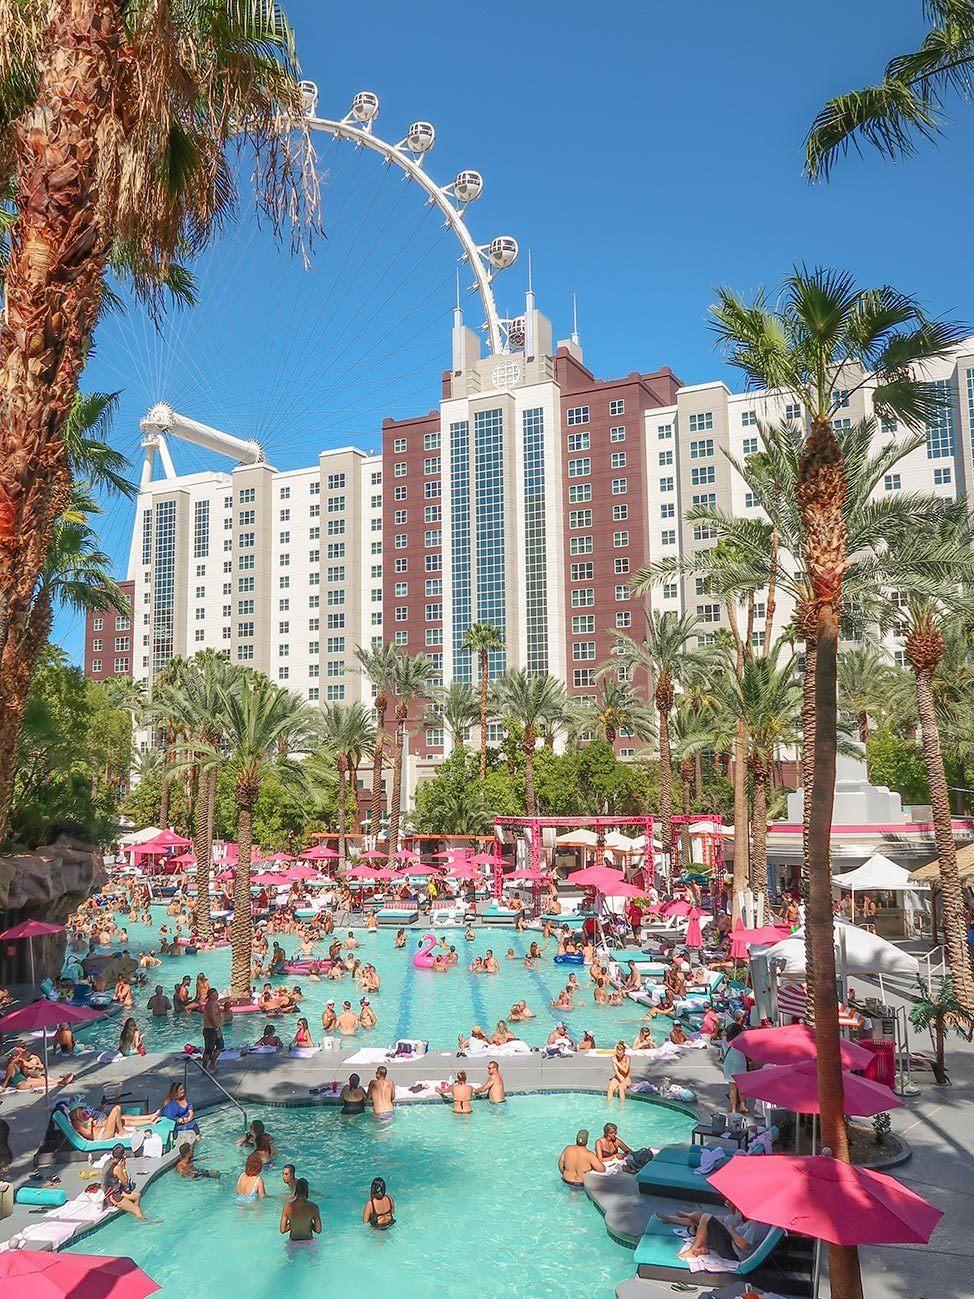 The Flamingo Pool